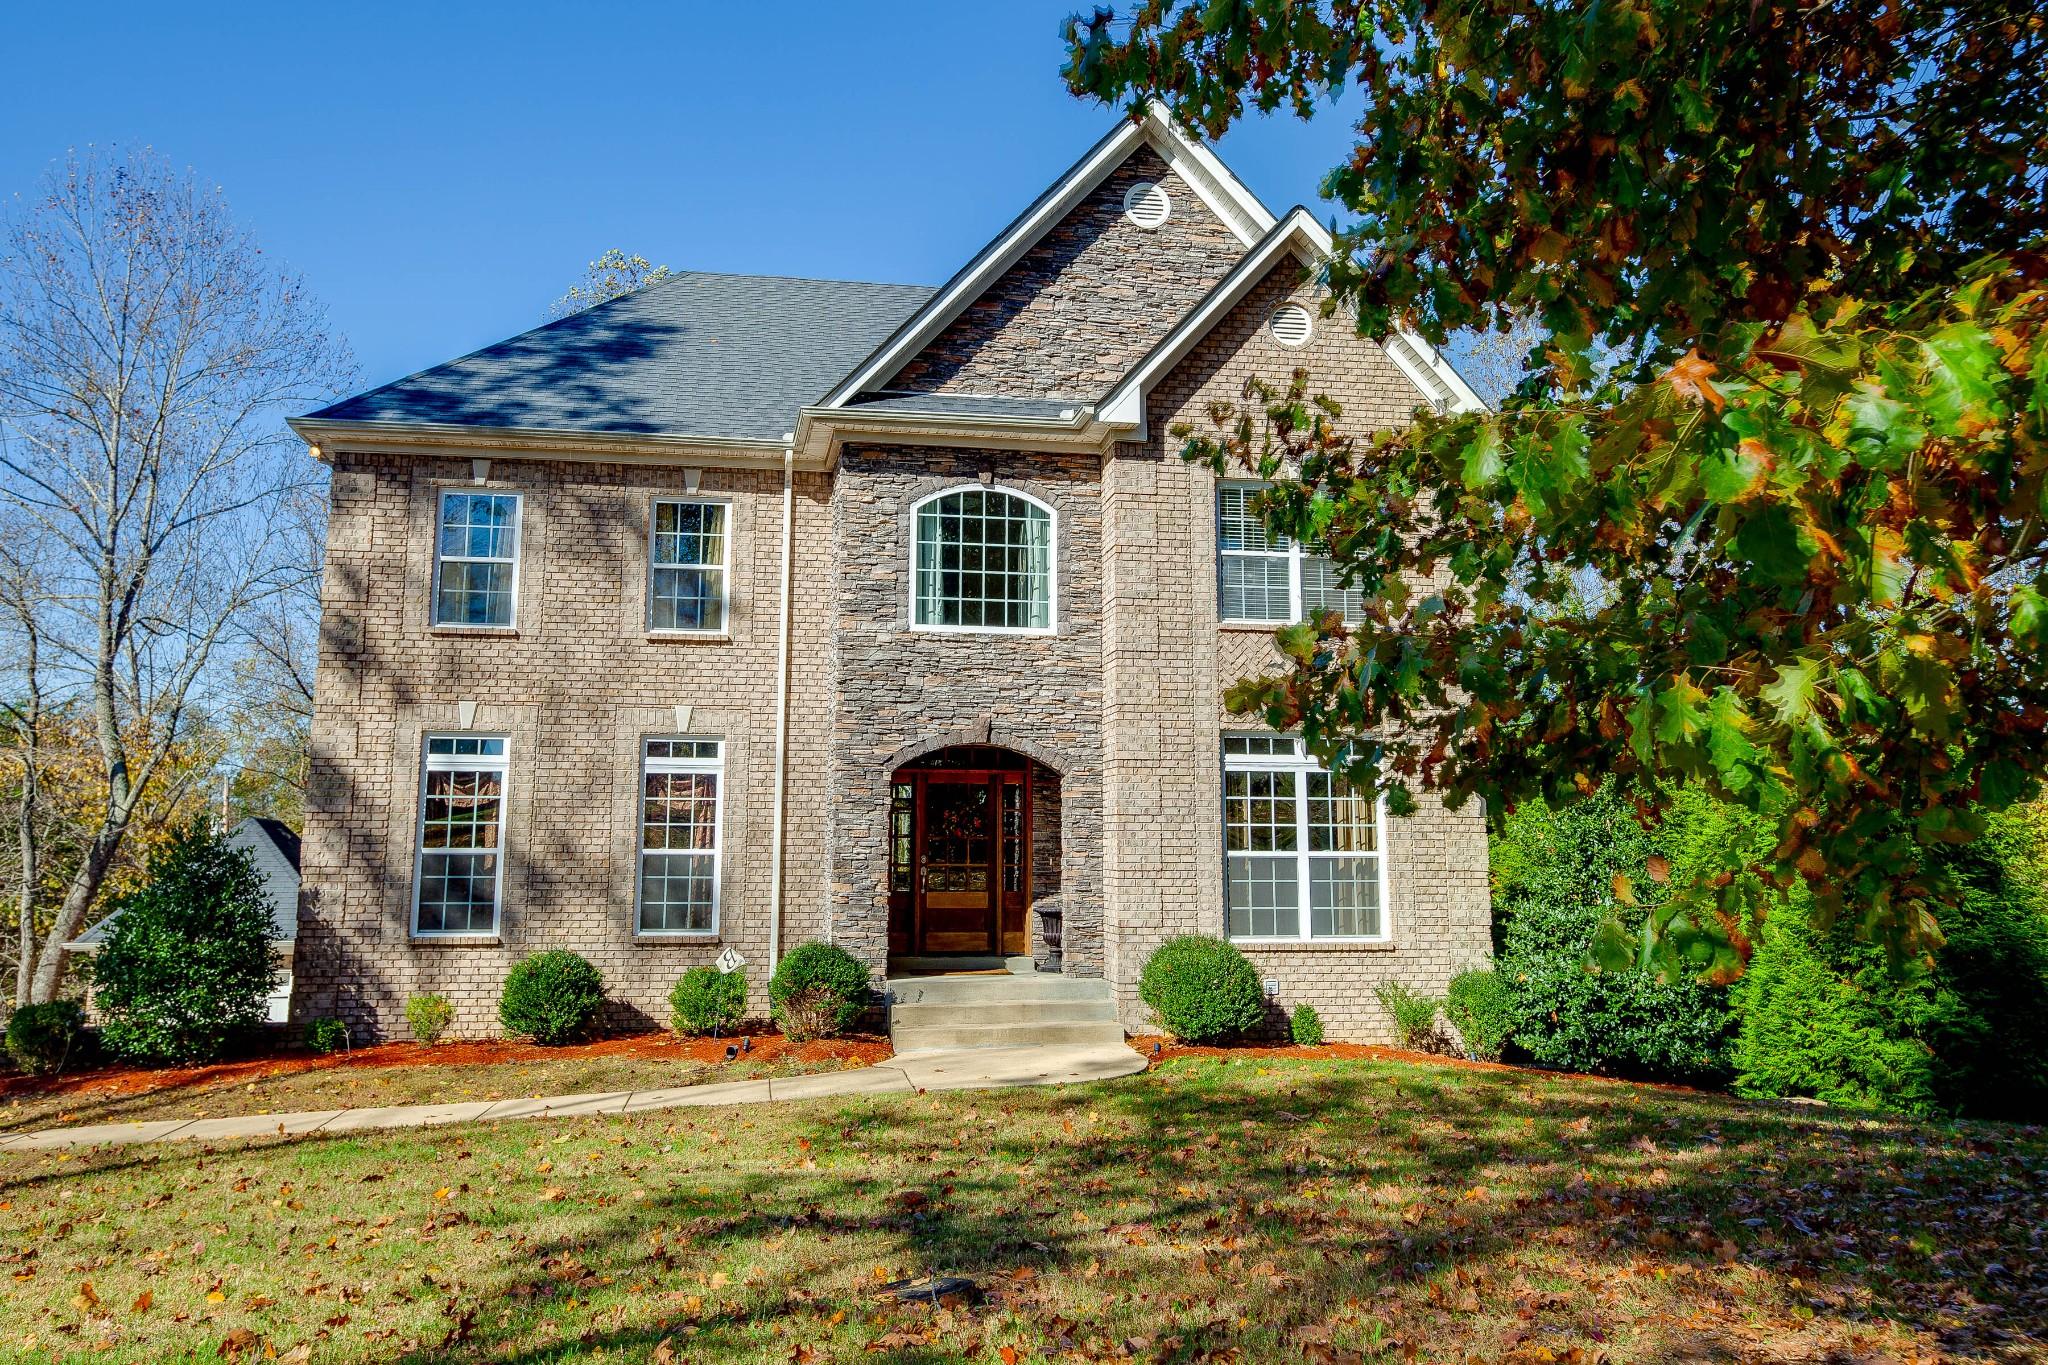 1008 Bee Tee Ln, Pleasant View, TN 37146 - Pleasant View, TN real estate listing